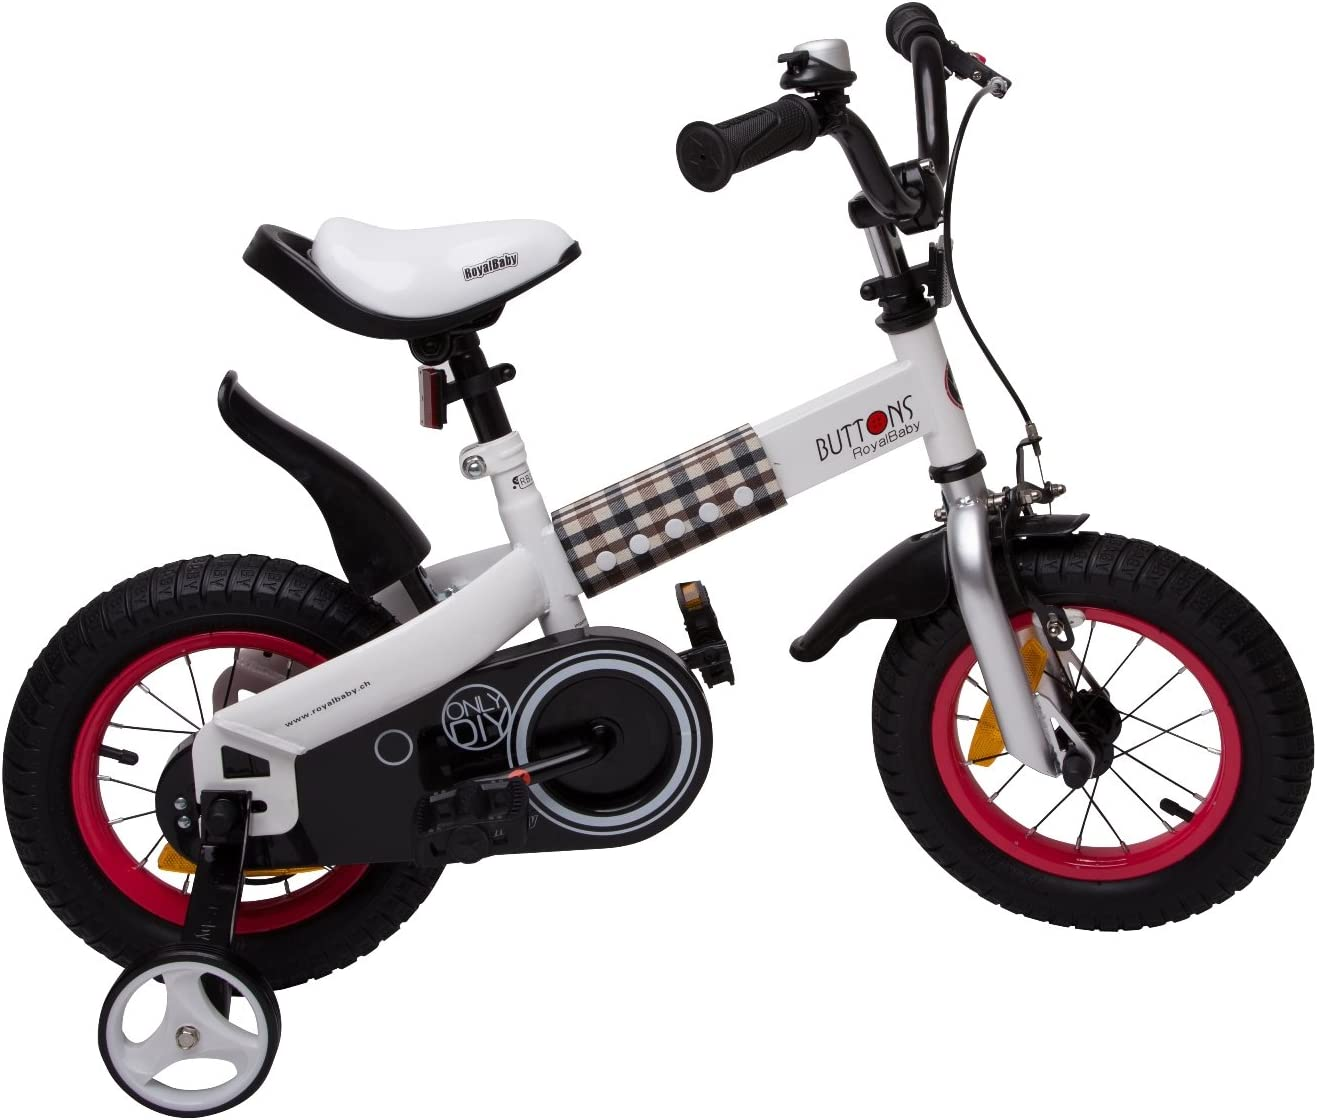 Bicicleta infantil 12 pulgadas Buttons ruedines contrapedal ...